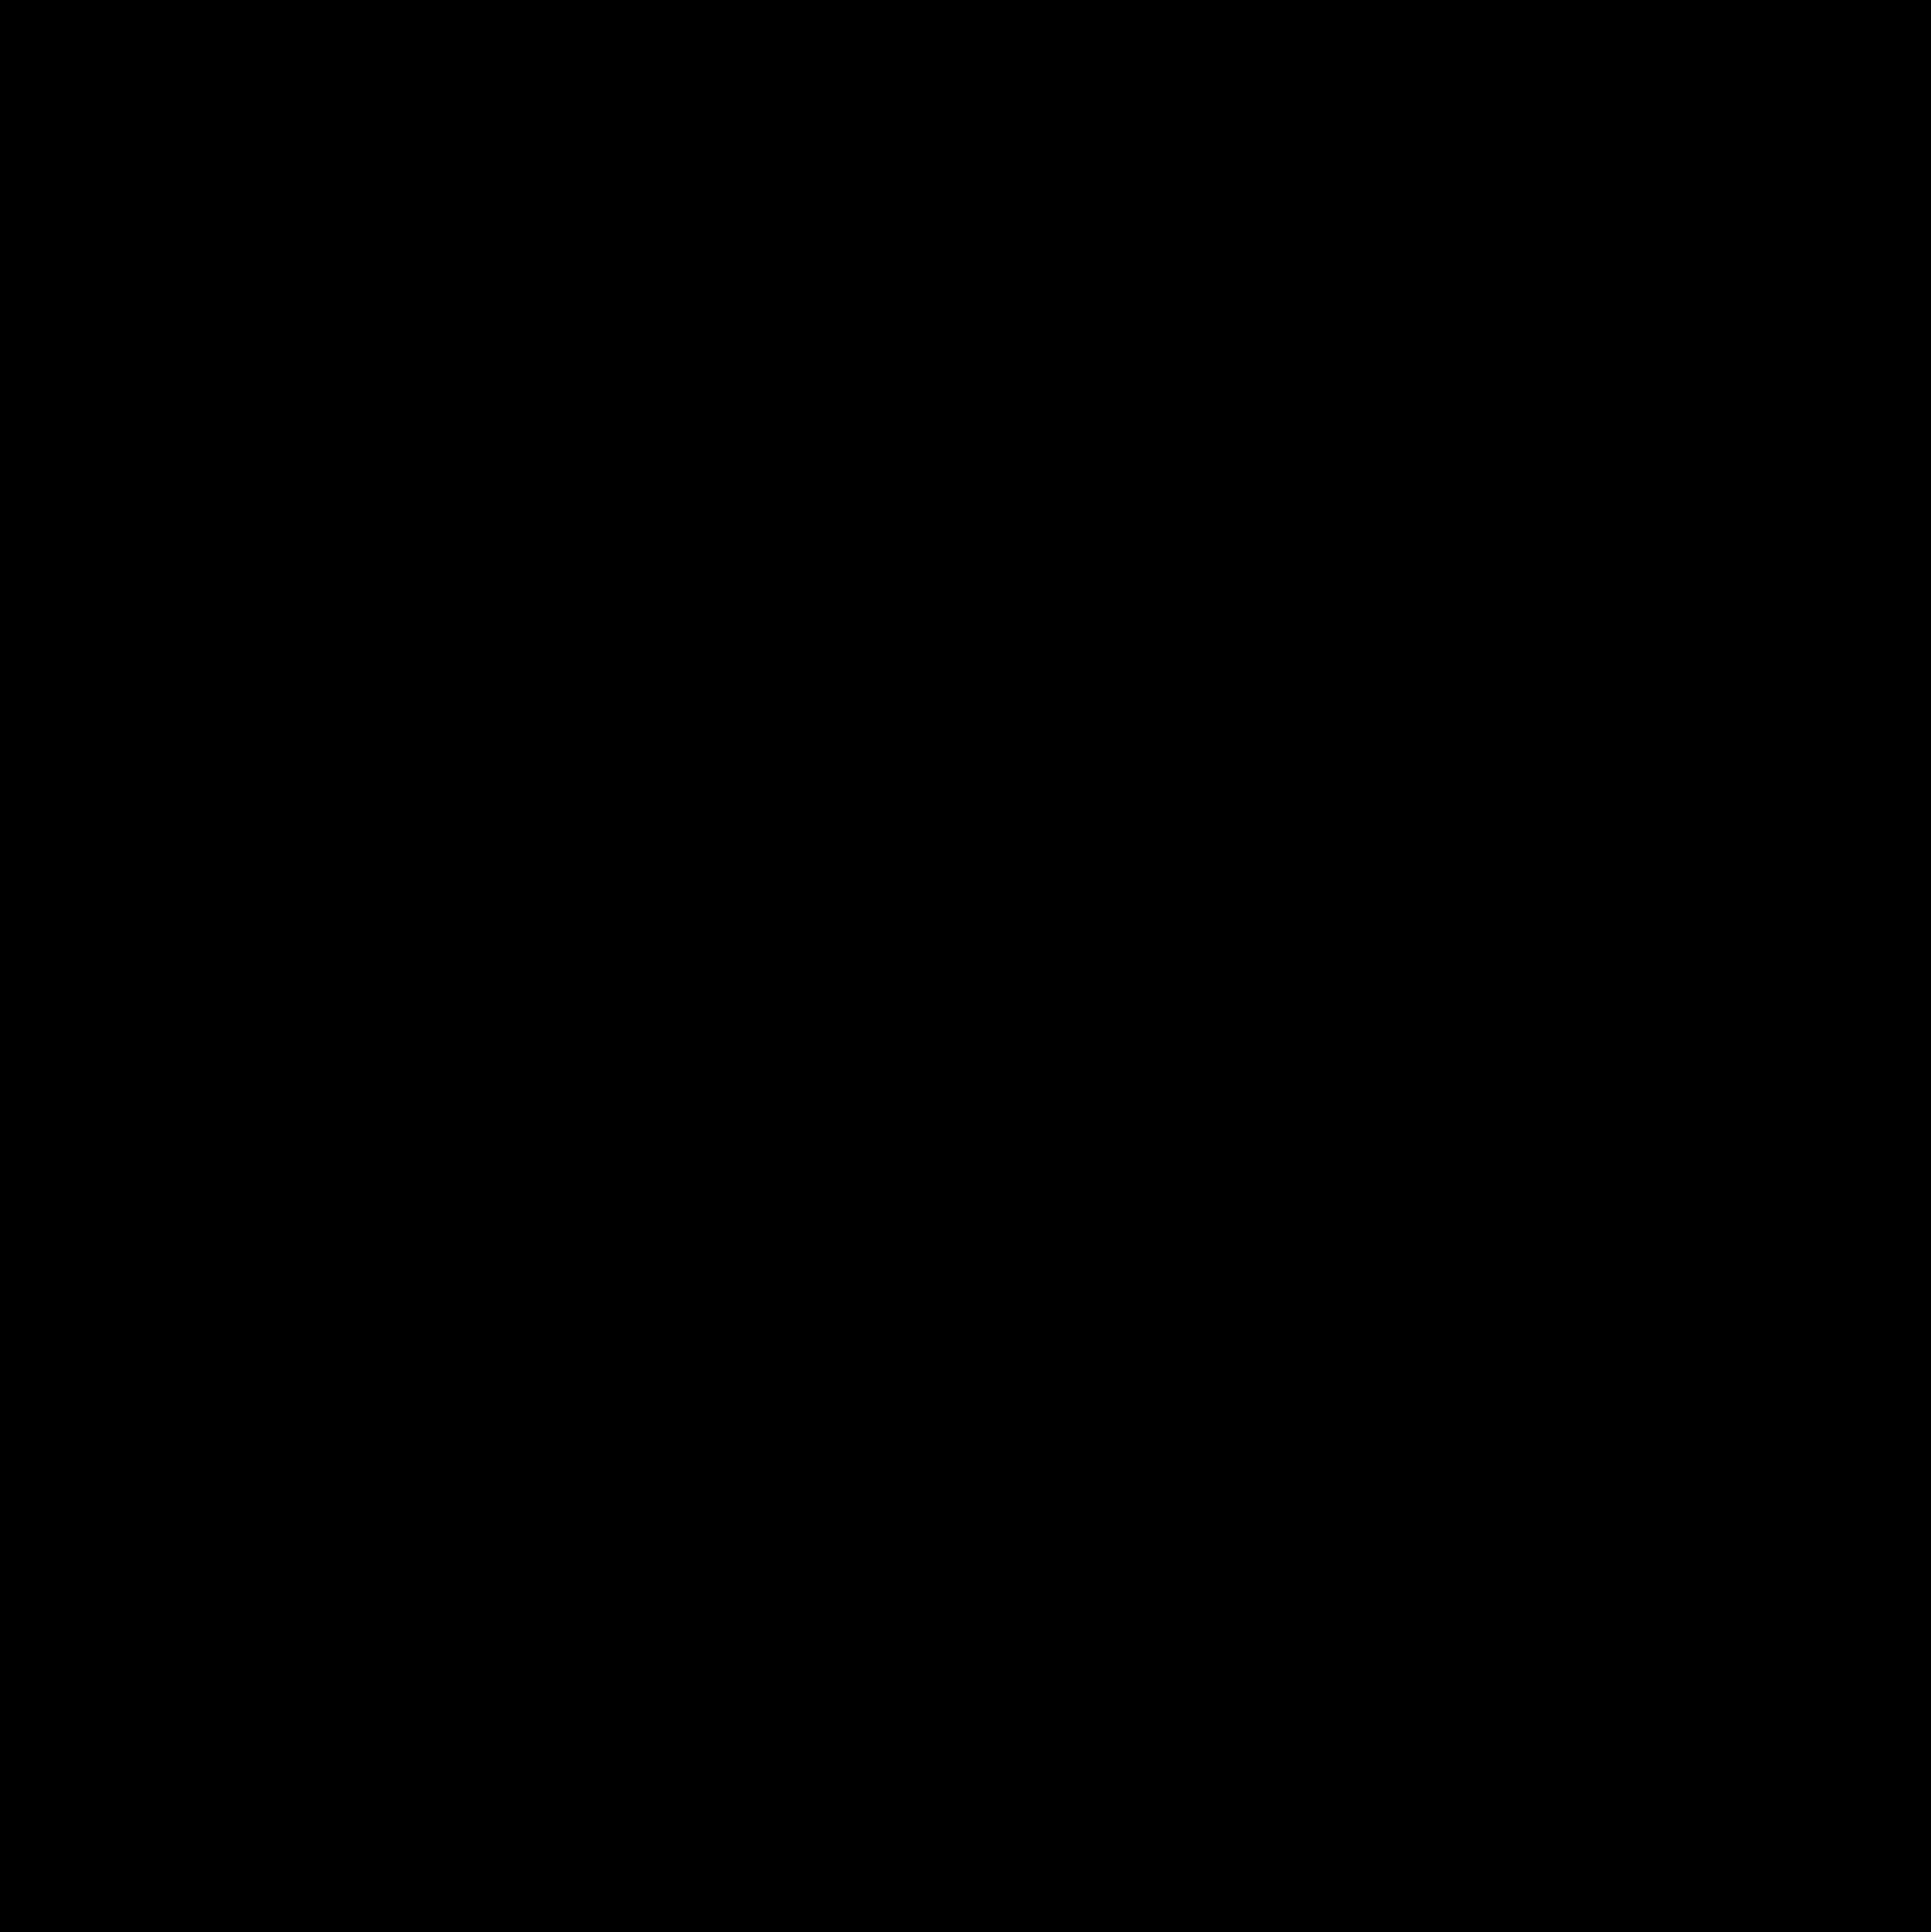 NoshAvatar-black (1).png